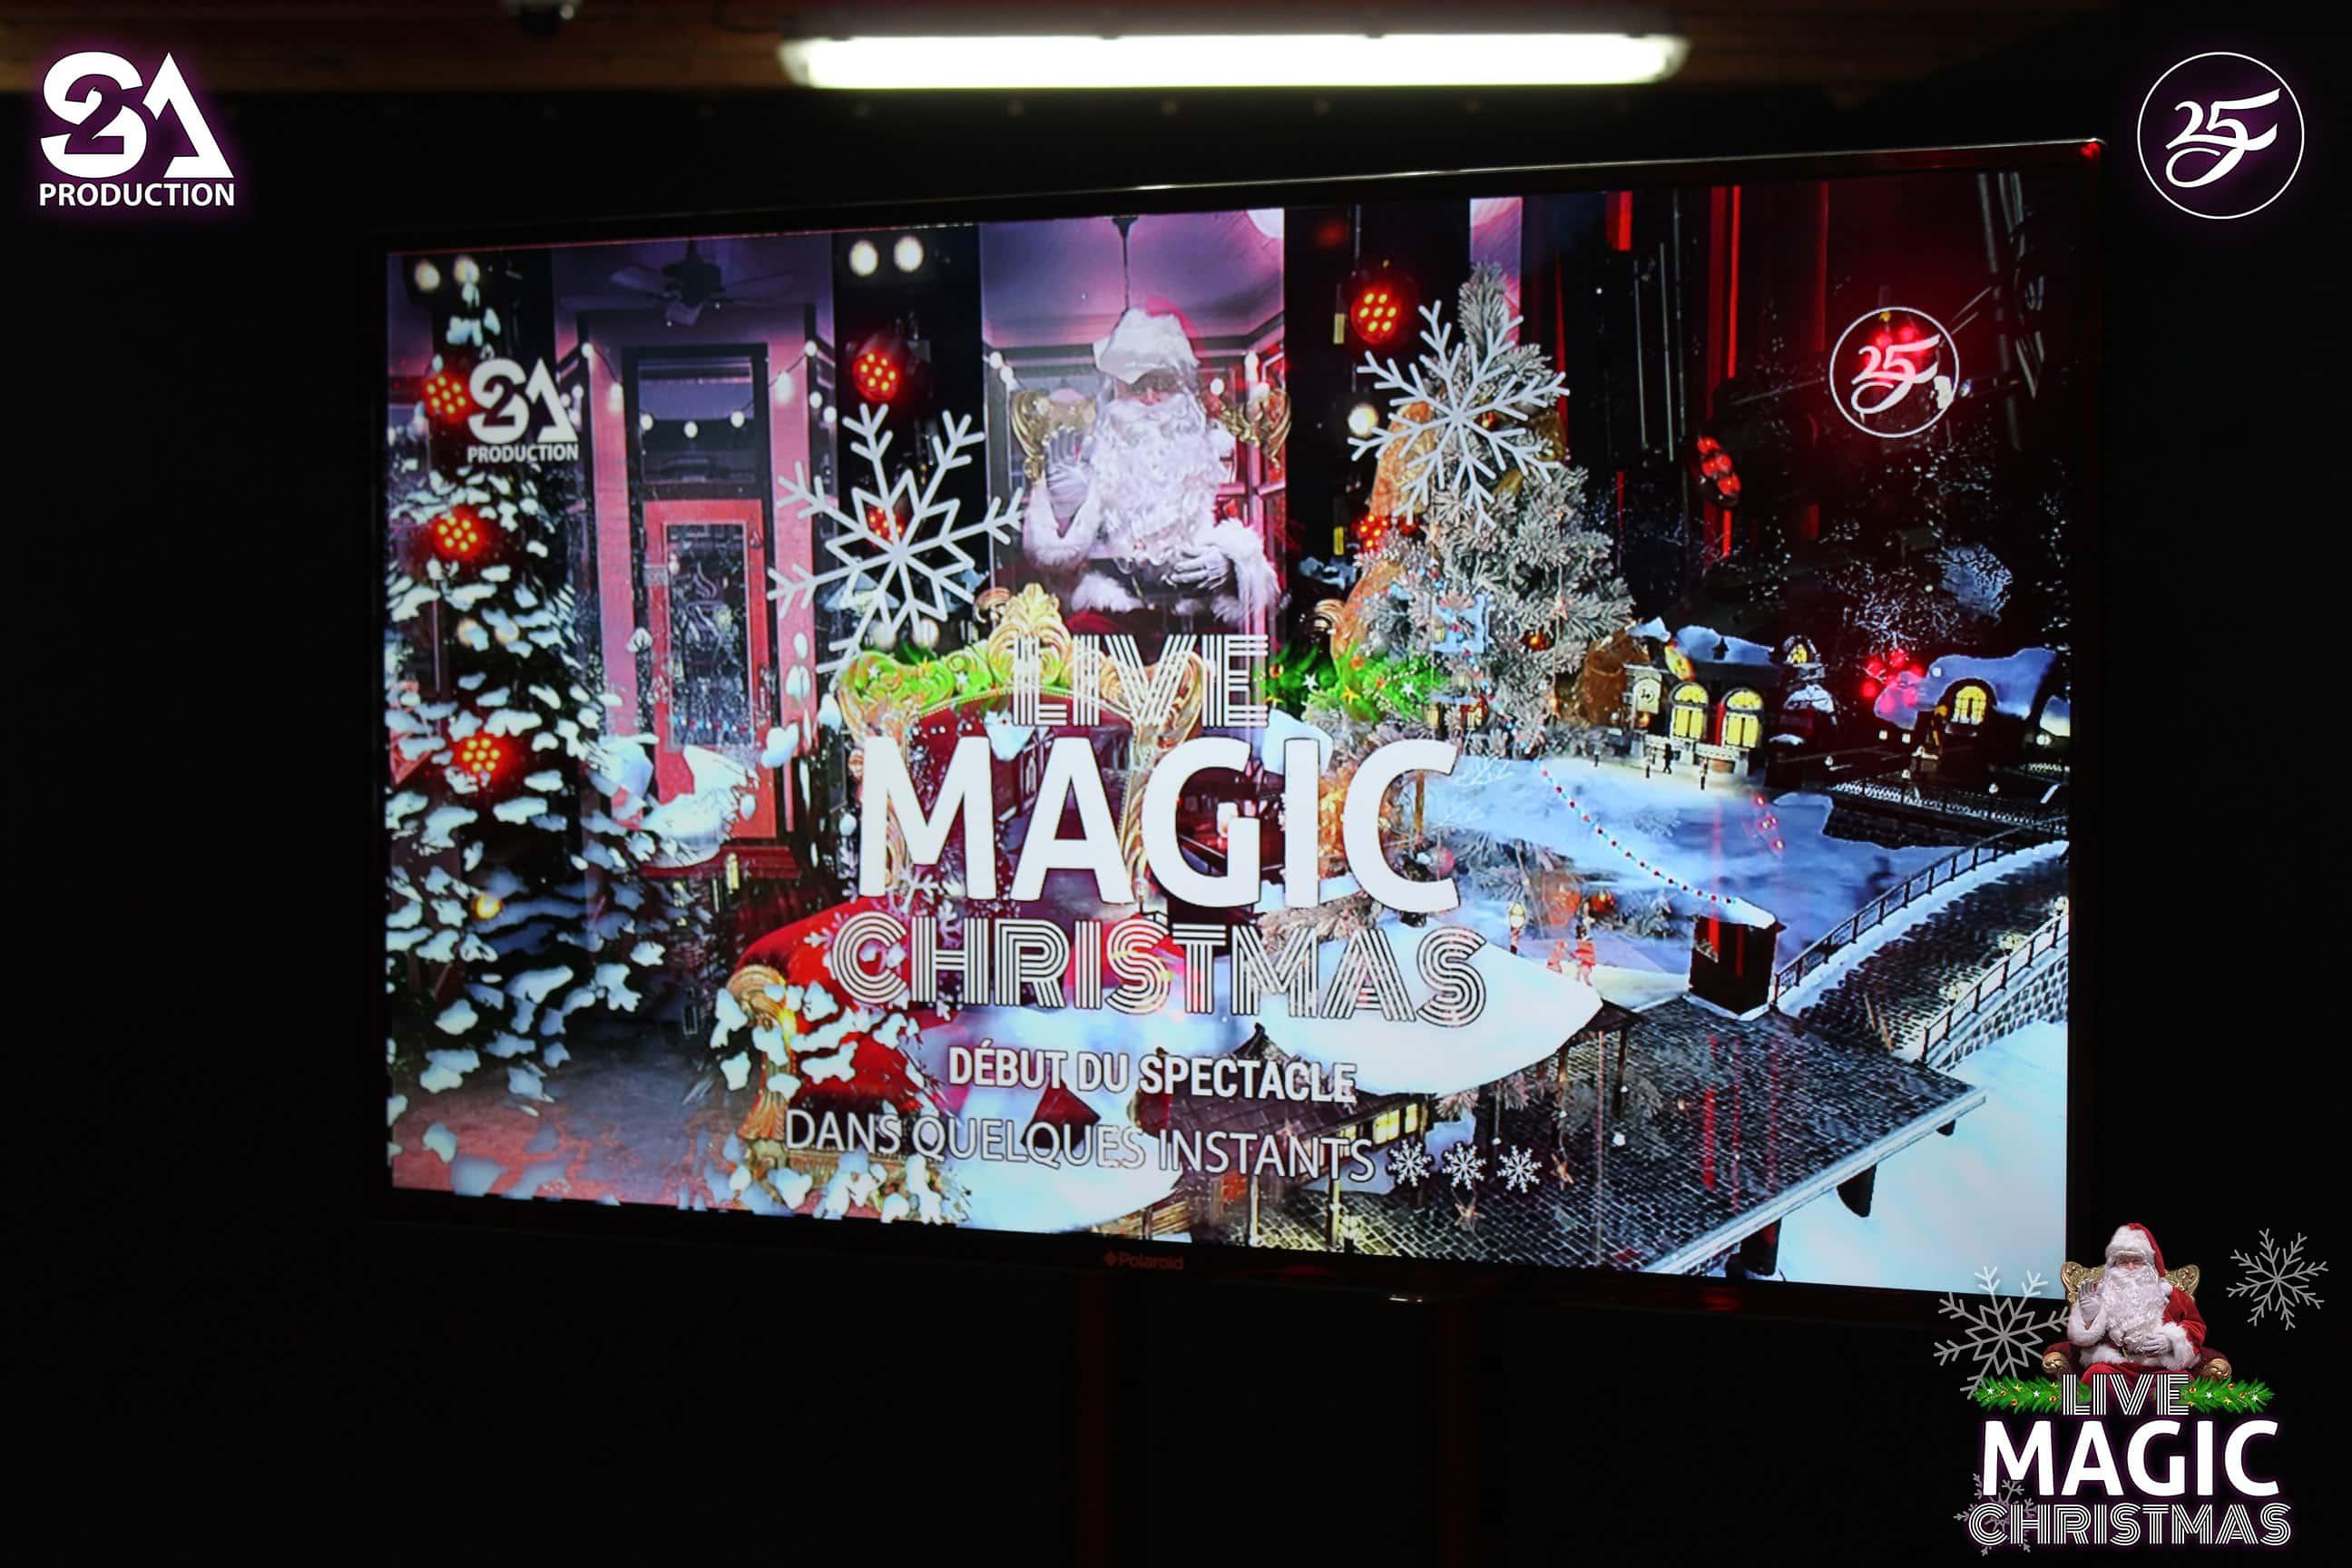 Live visio Magic Christmas